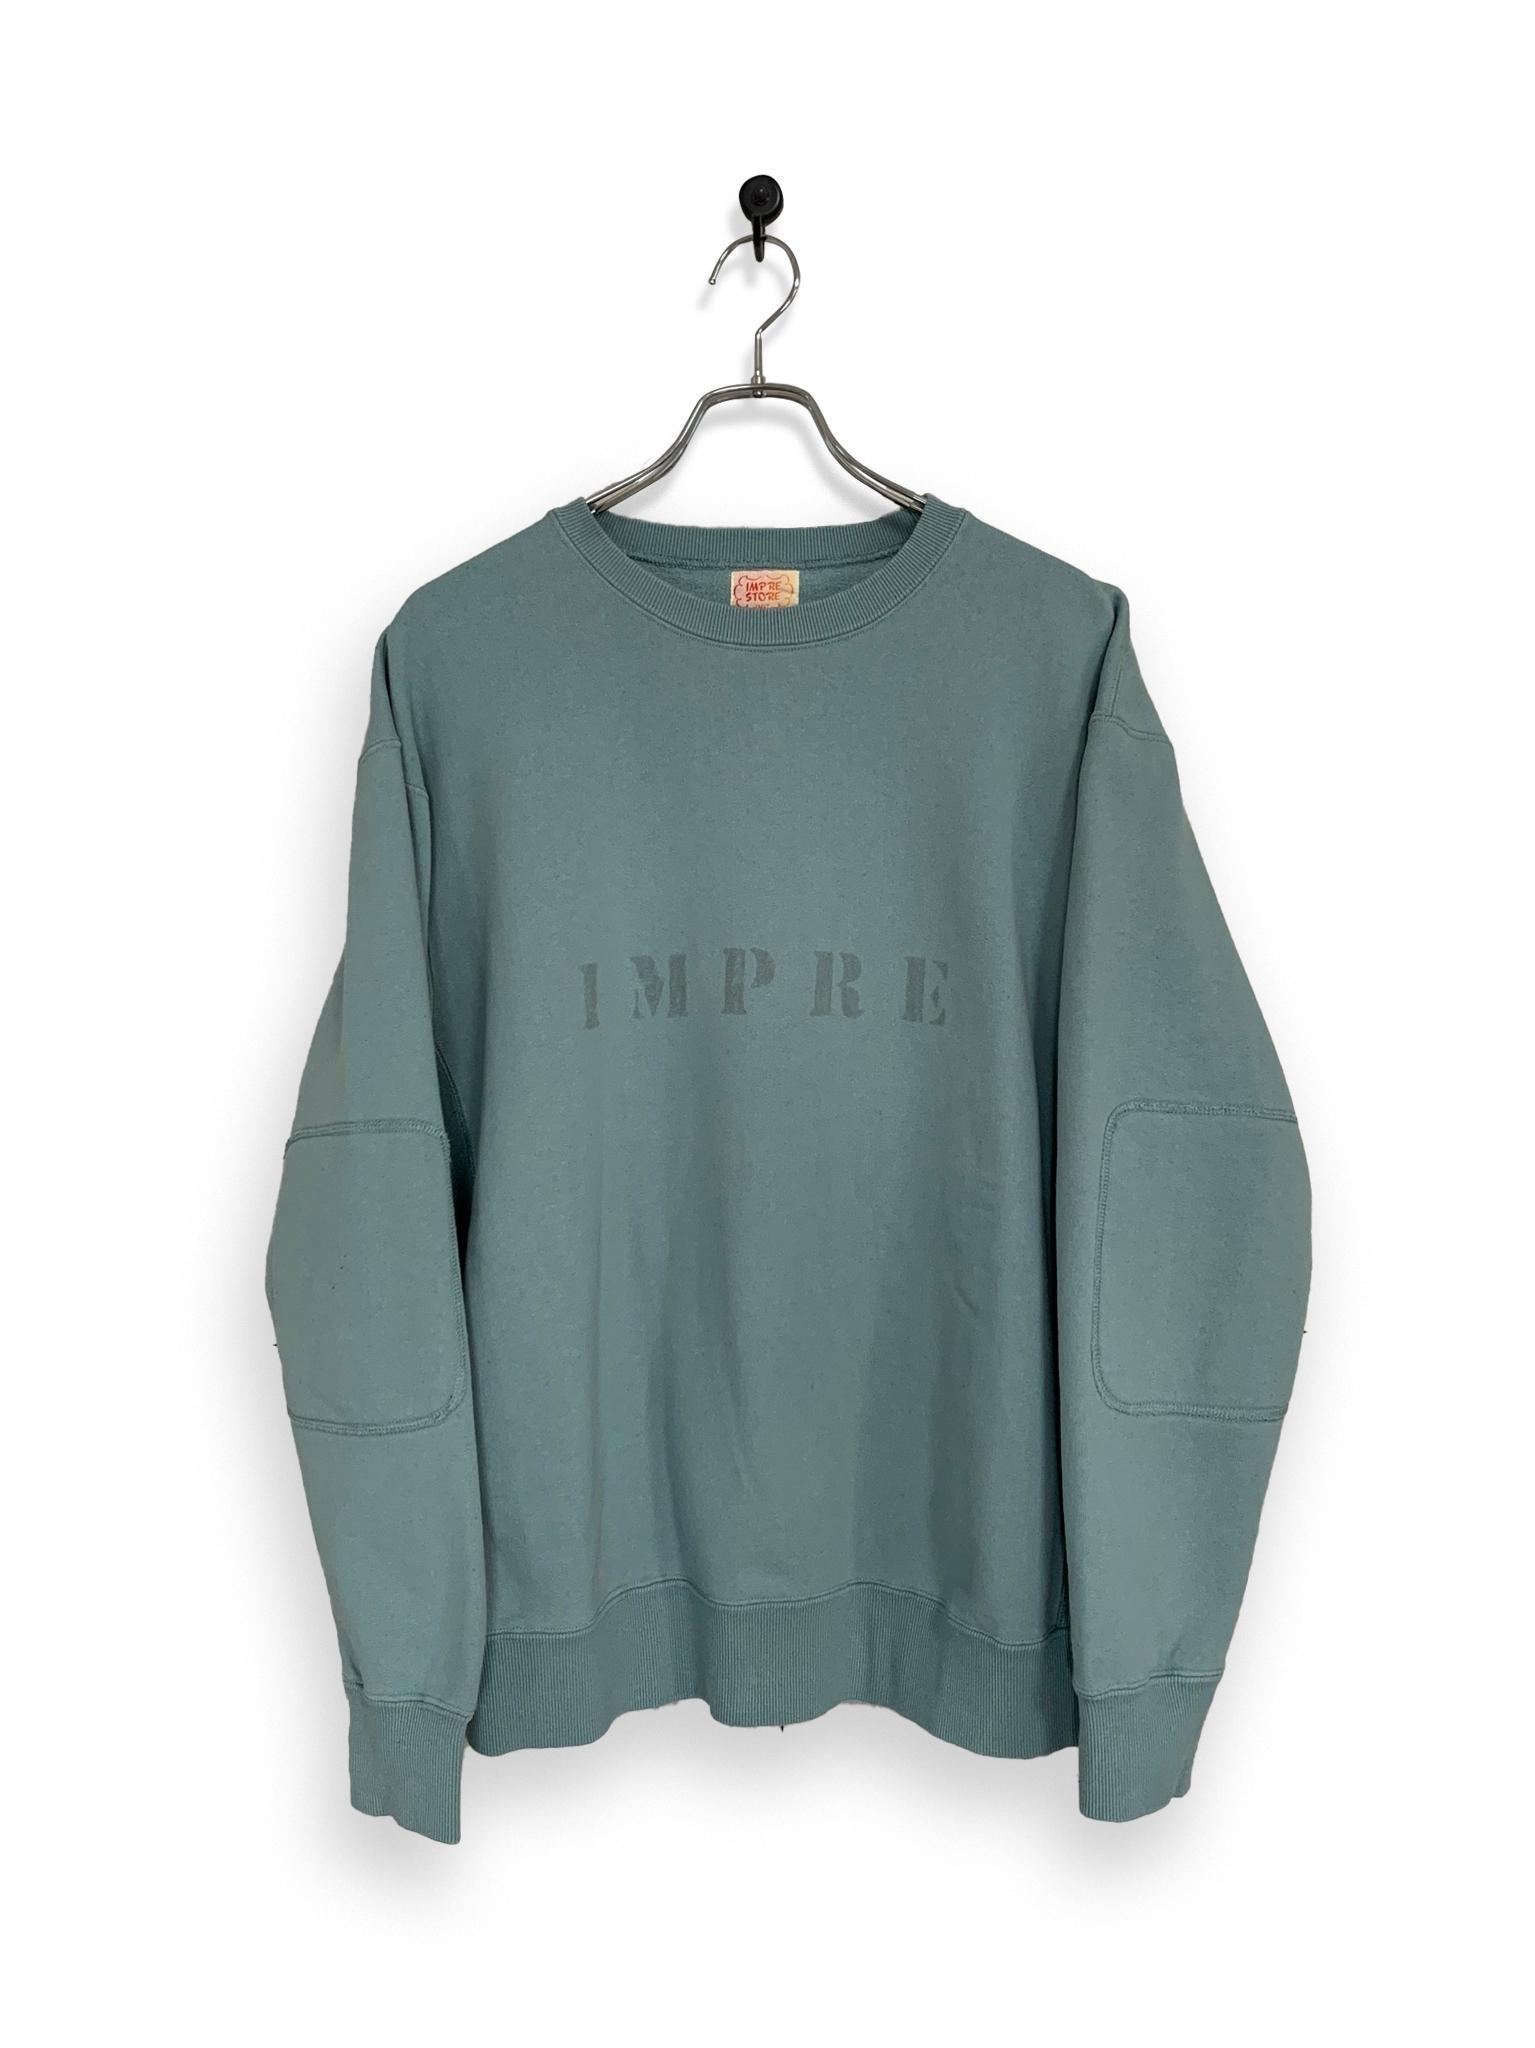 Original Sweatshirt / stencil / sax blue